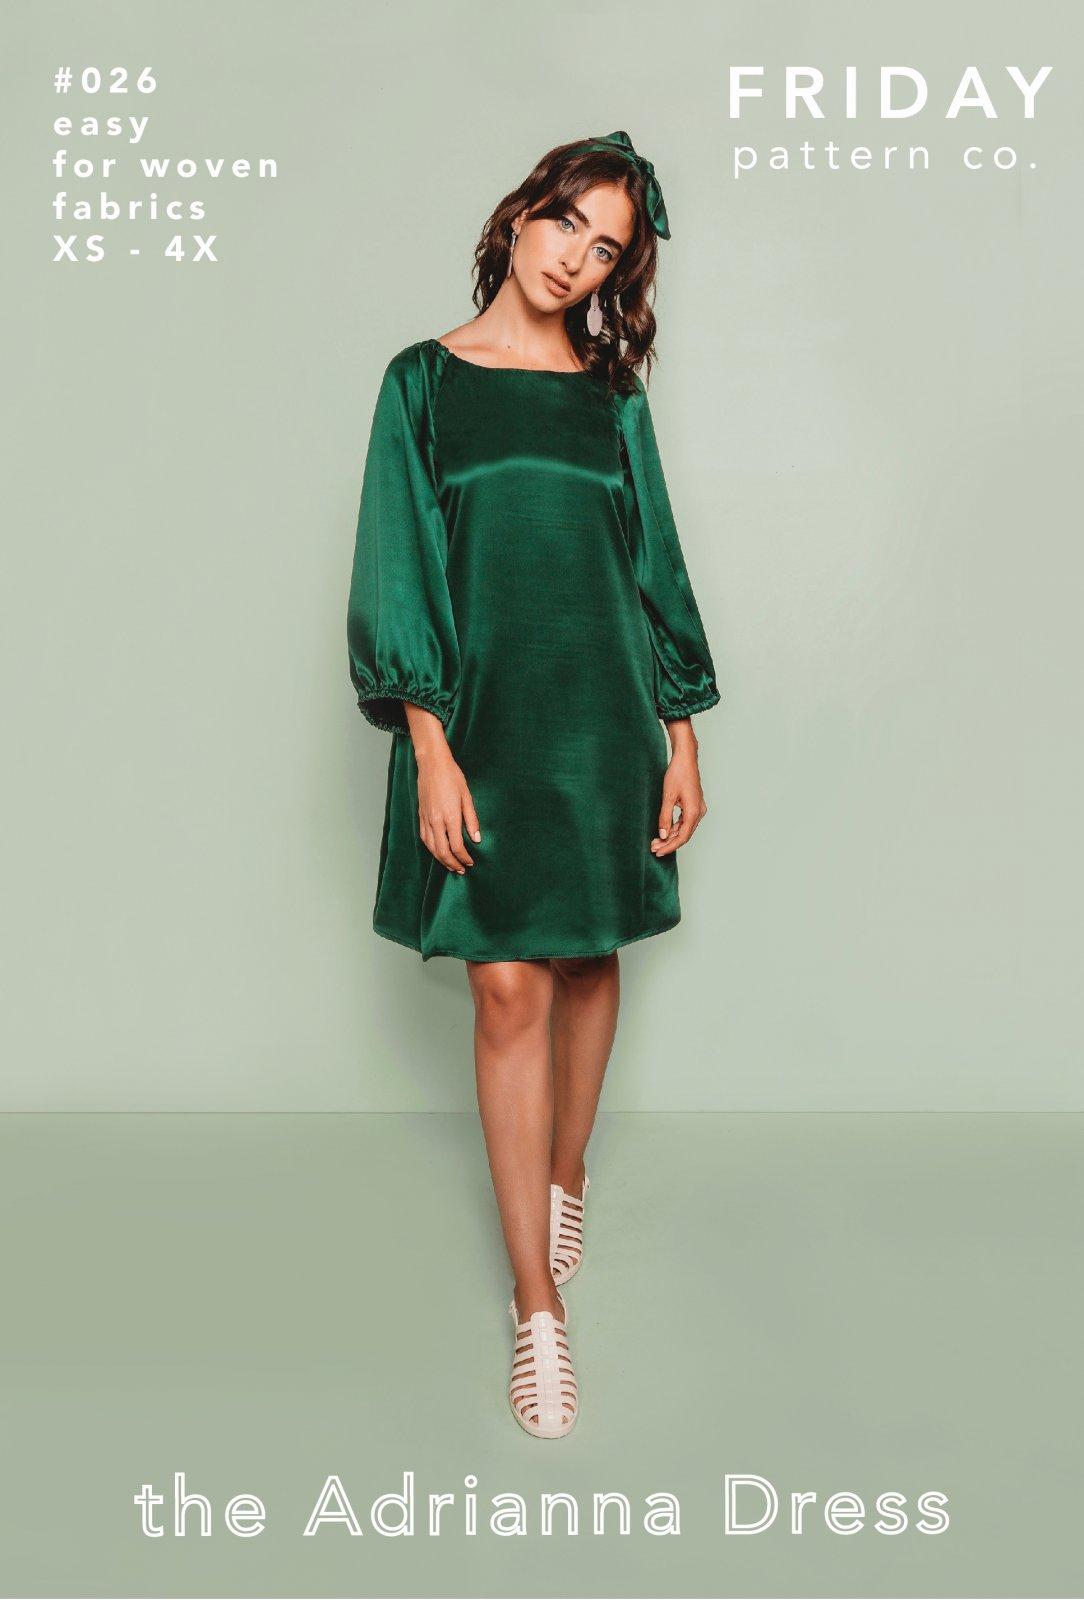 Friday Pattern Co Adrianna Dress Pattern